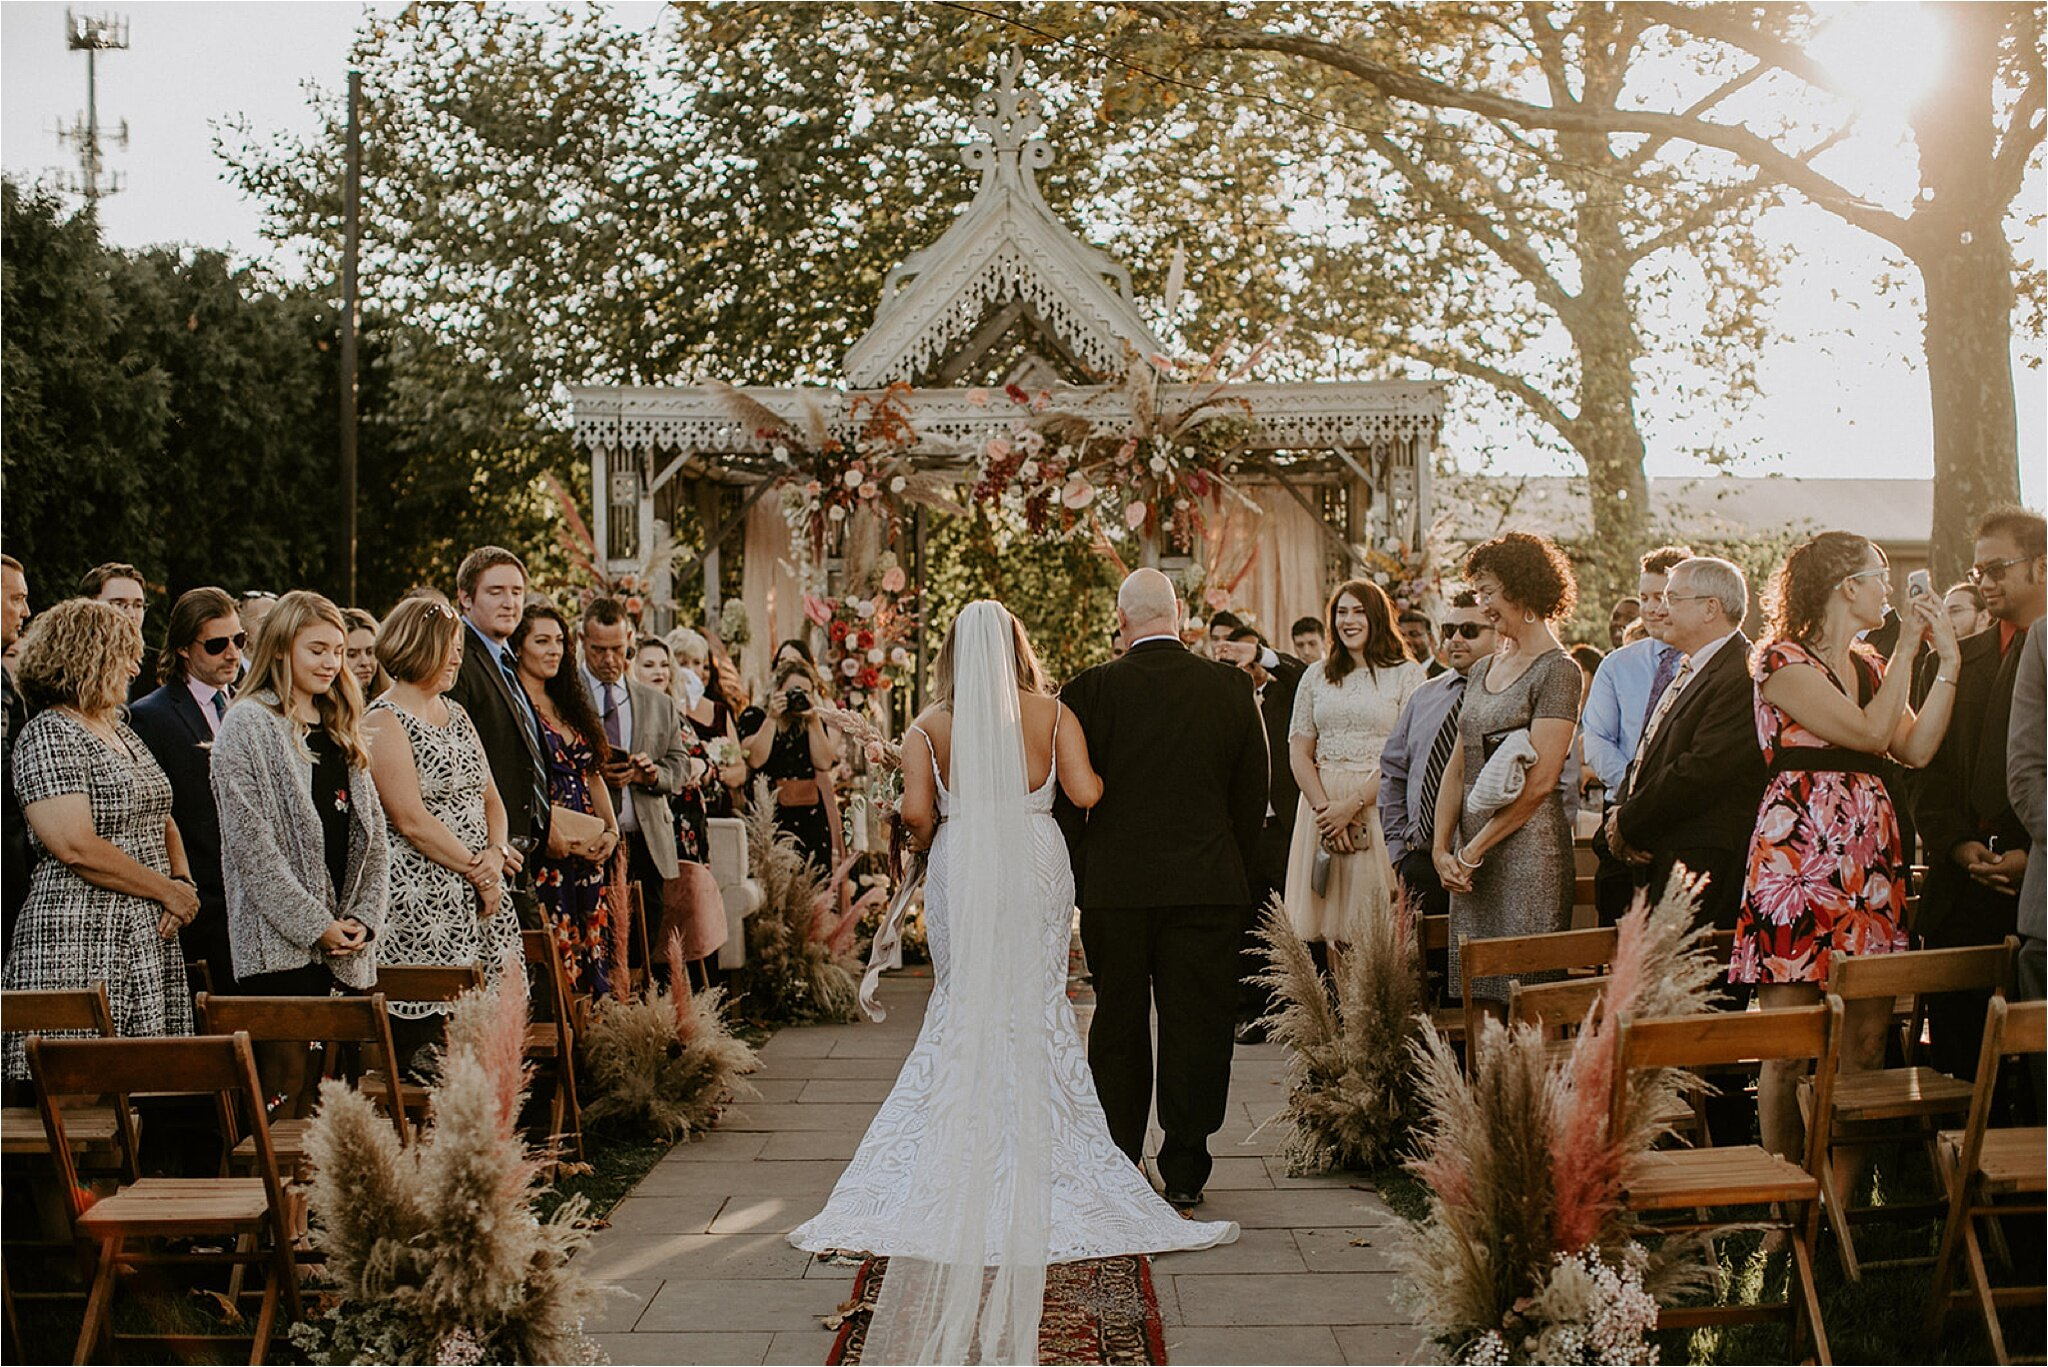 Bruid loopt met haar vader naar het altaar